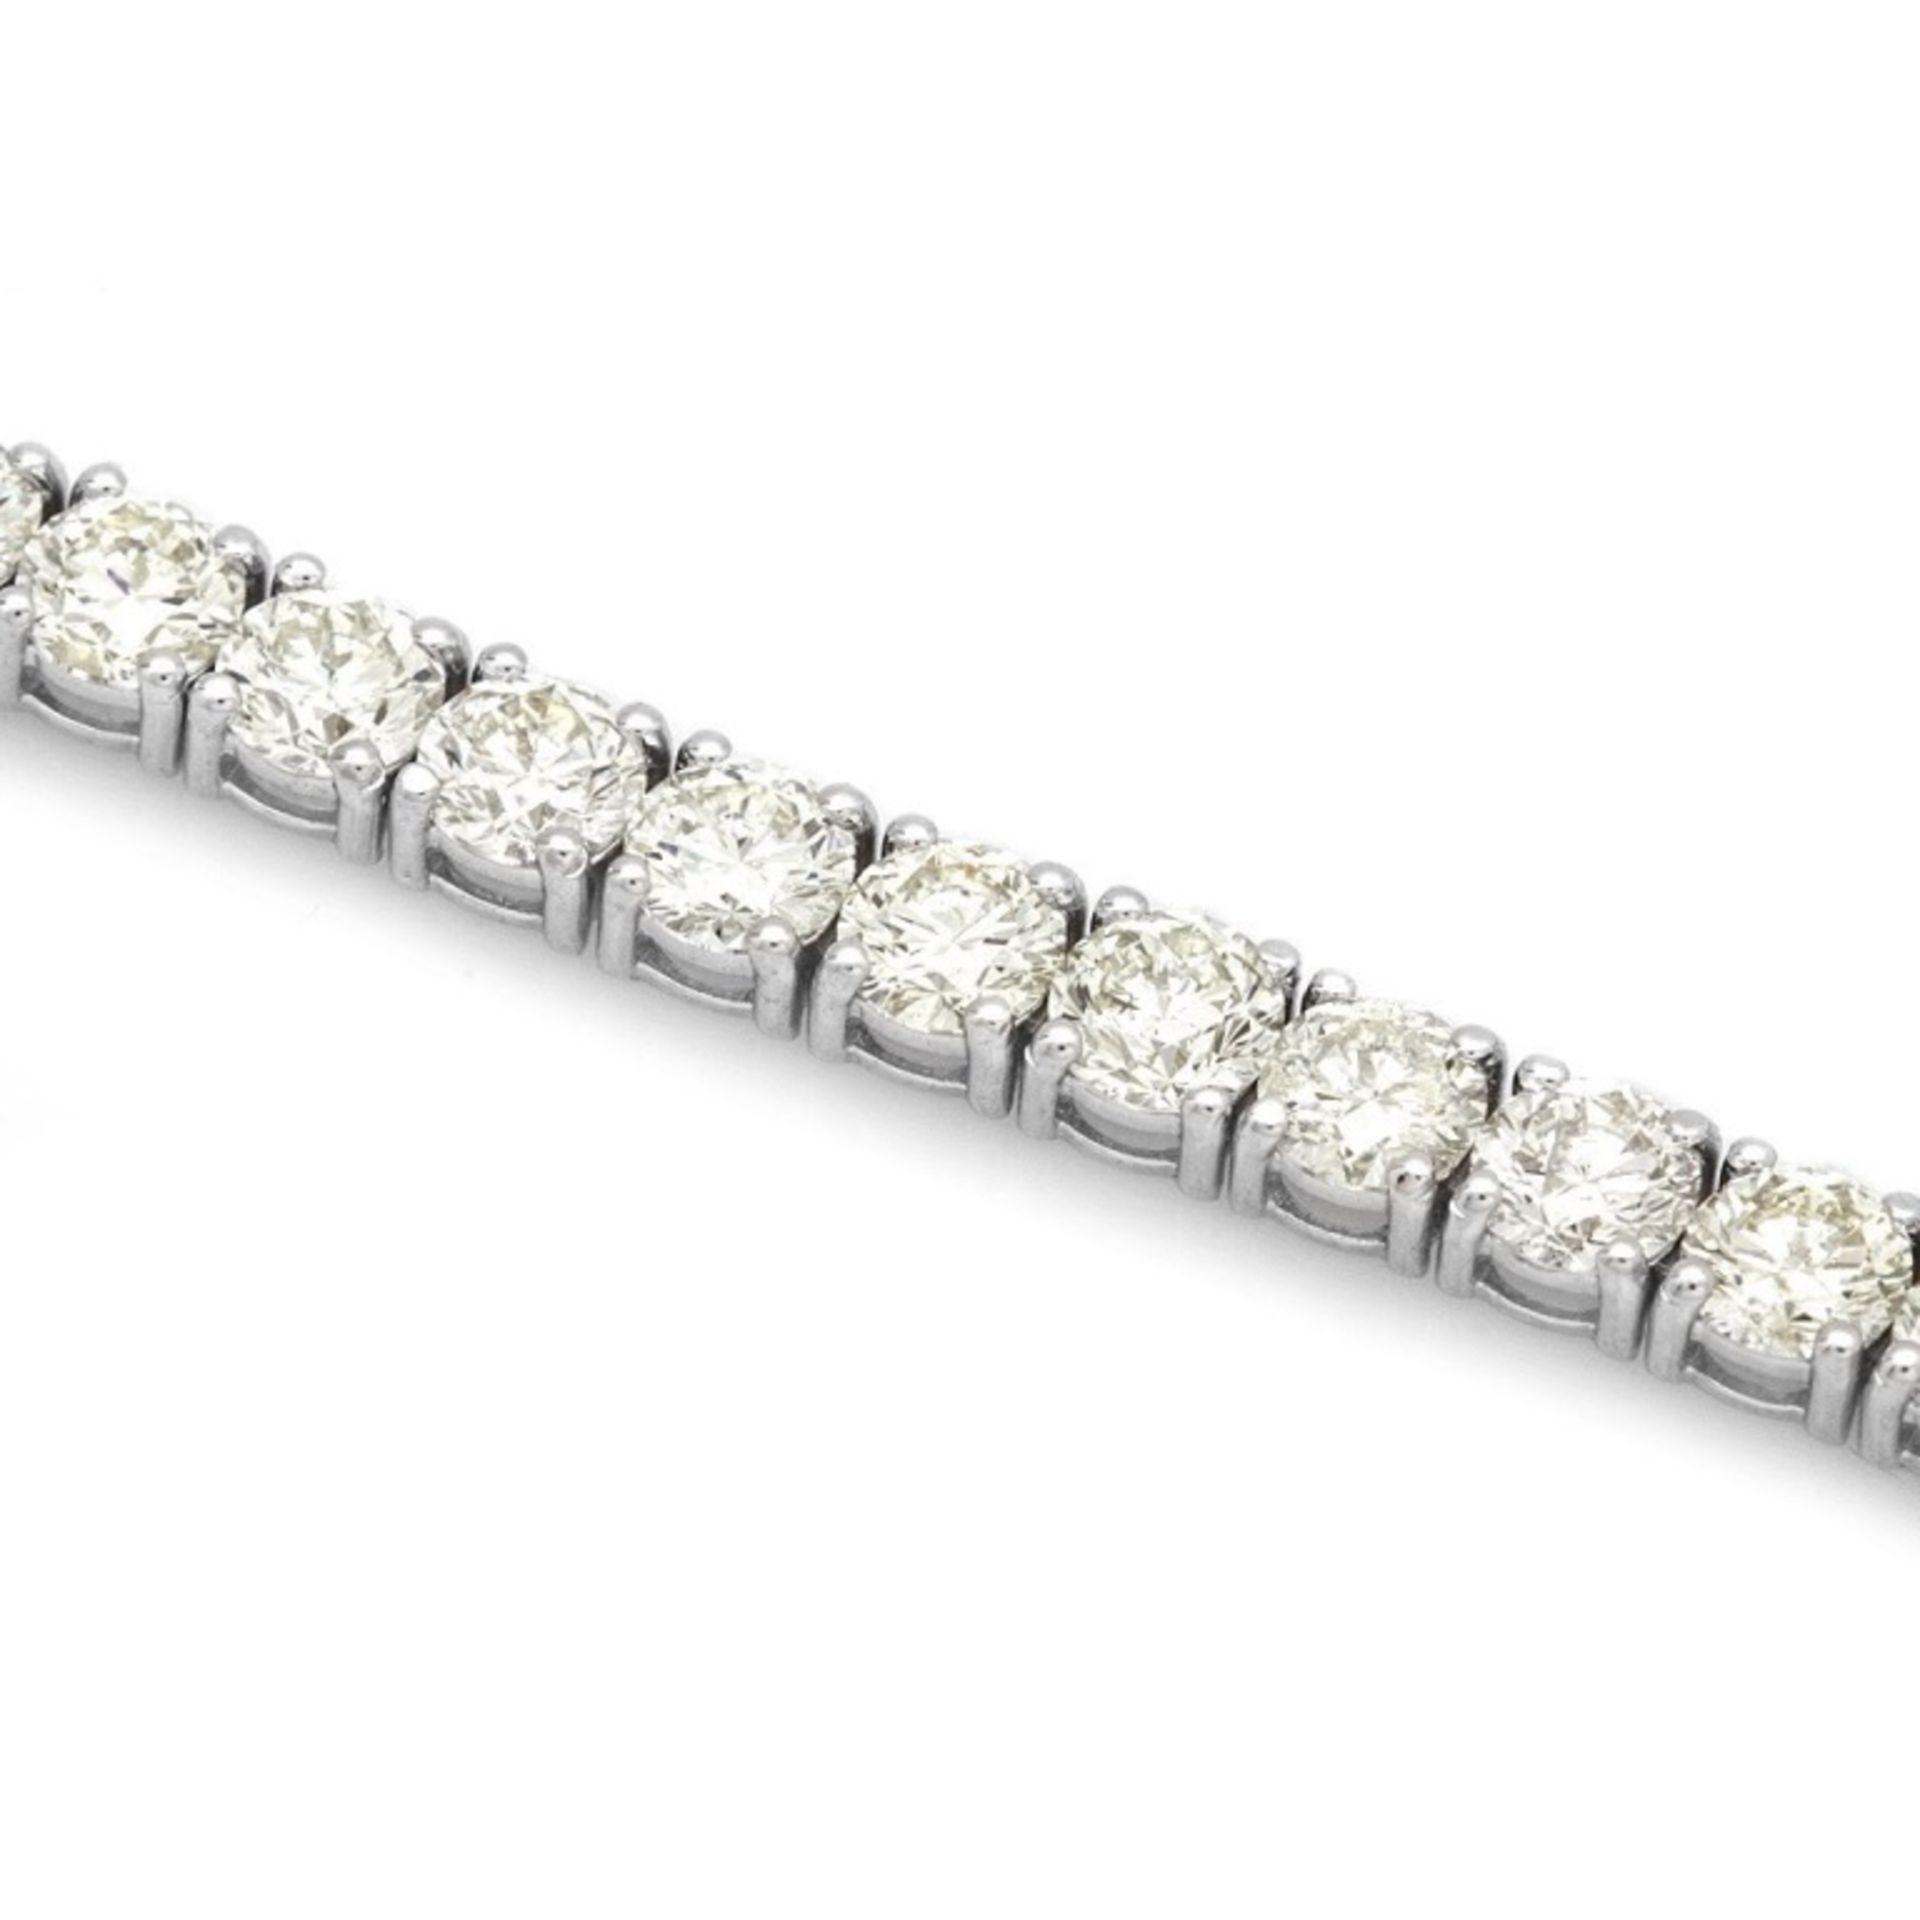 18k White Gold 12.00ct Diamond Tennis Bracelet - Image 3 of 4